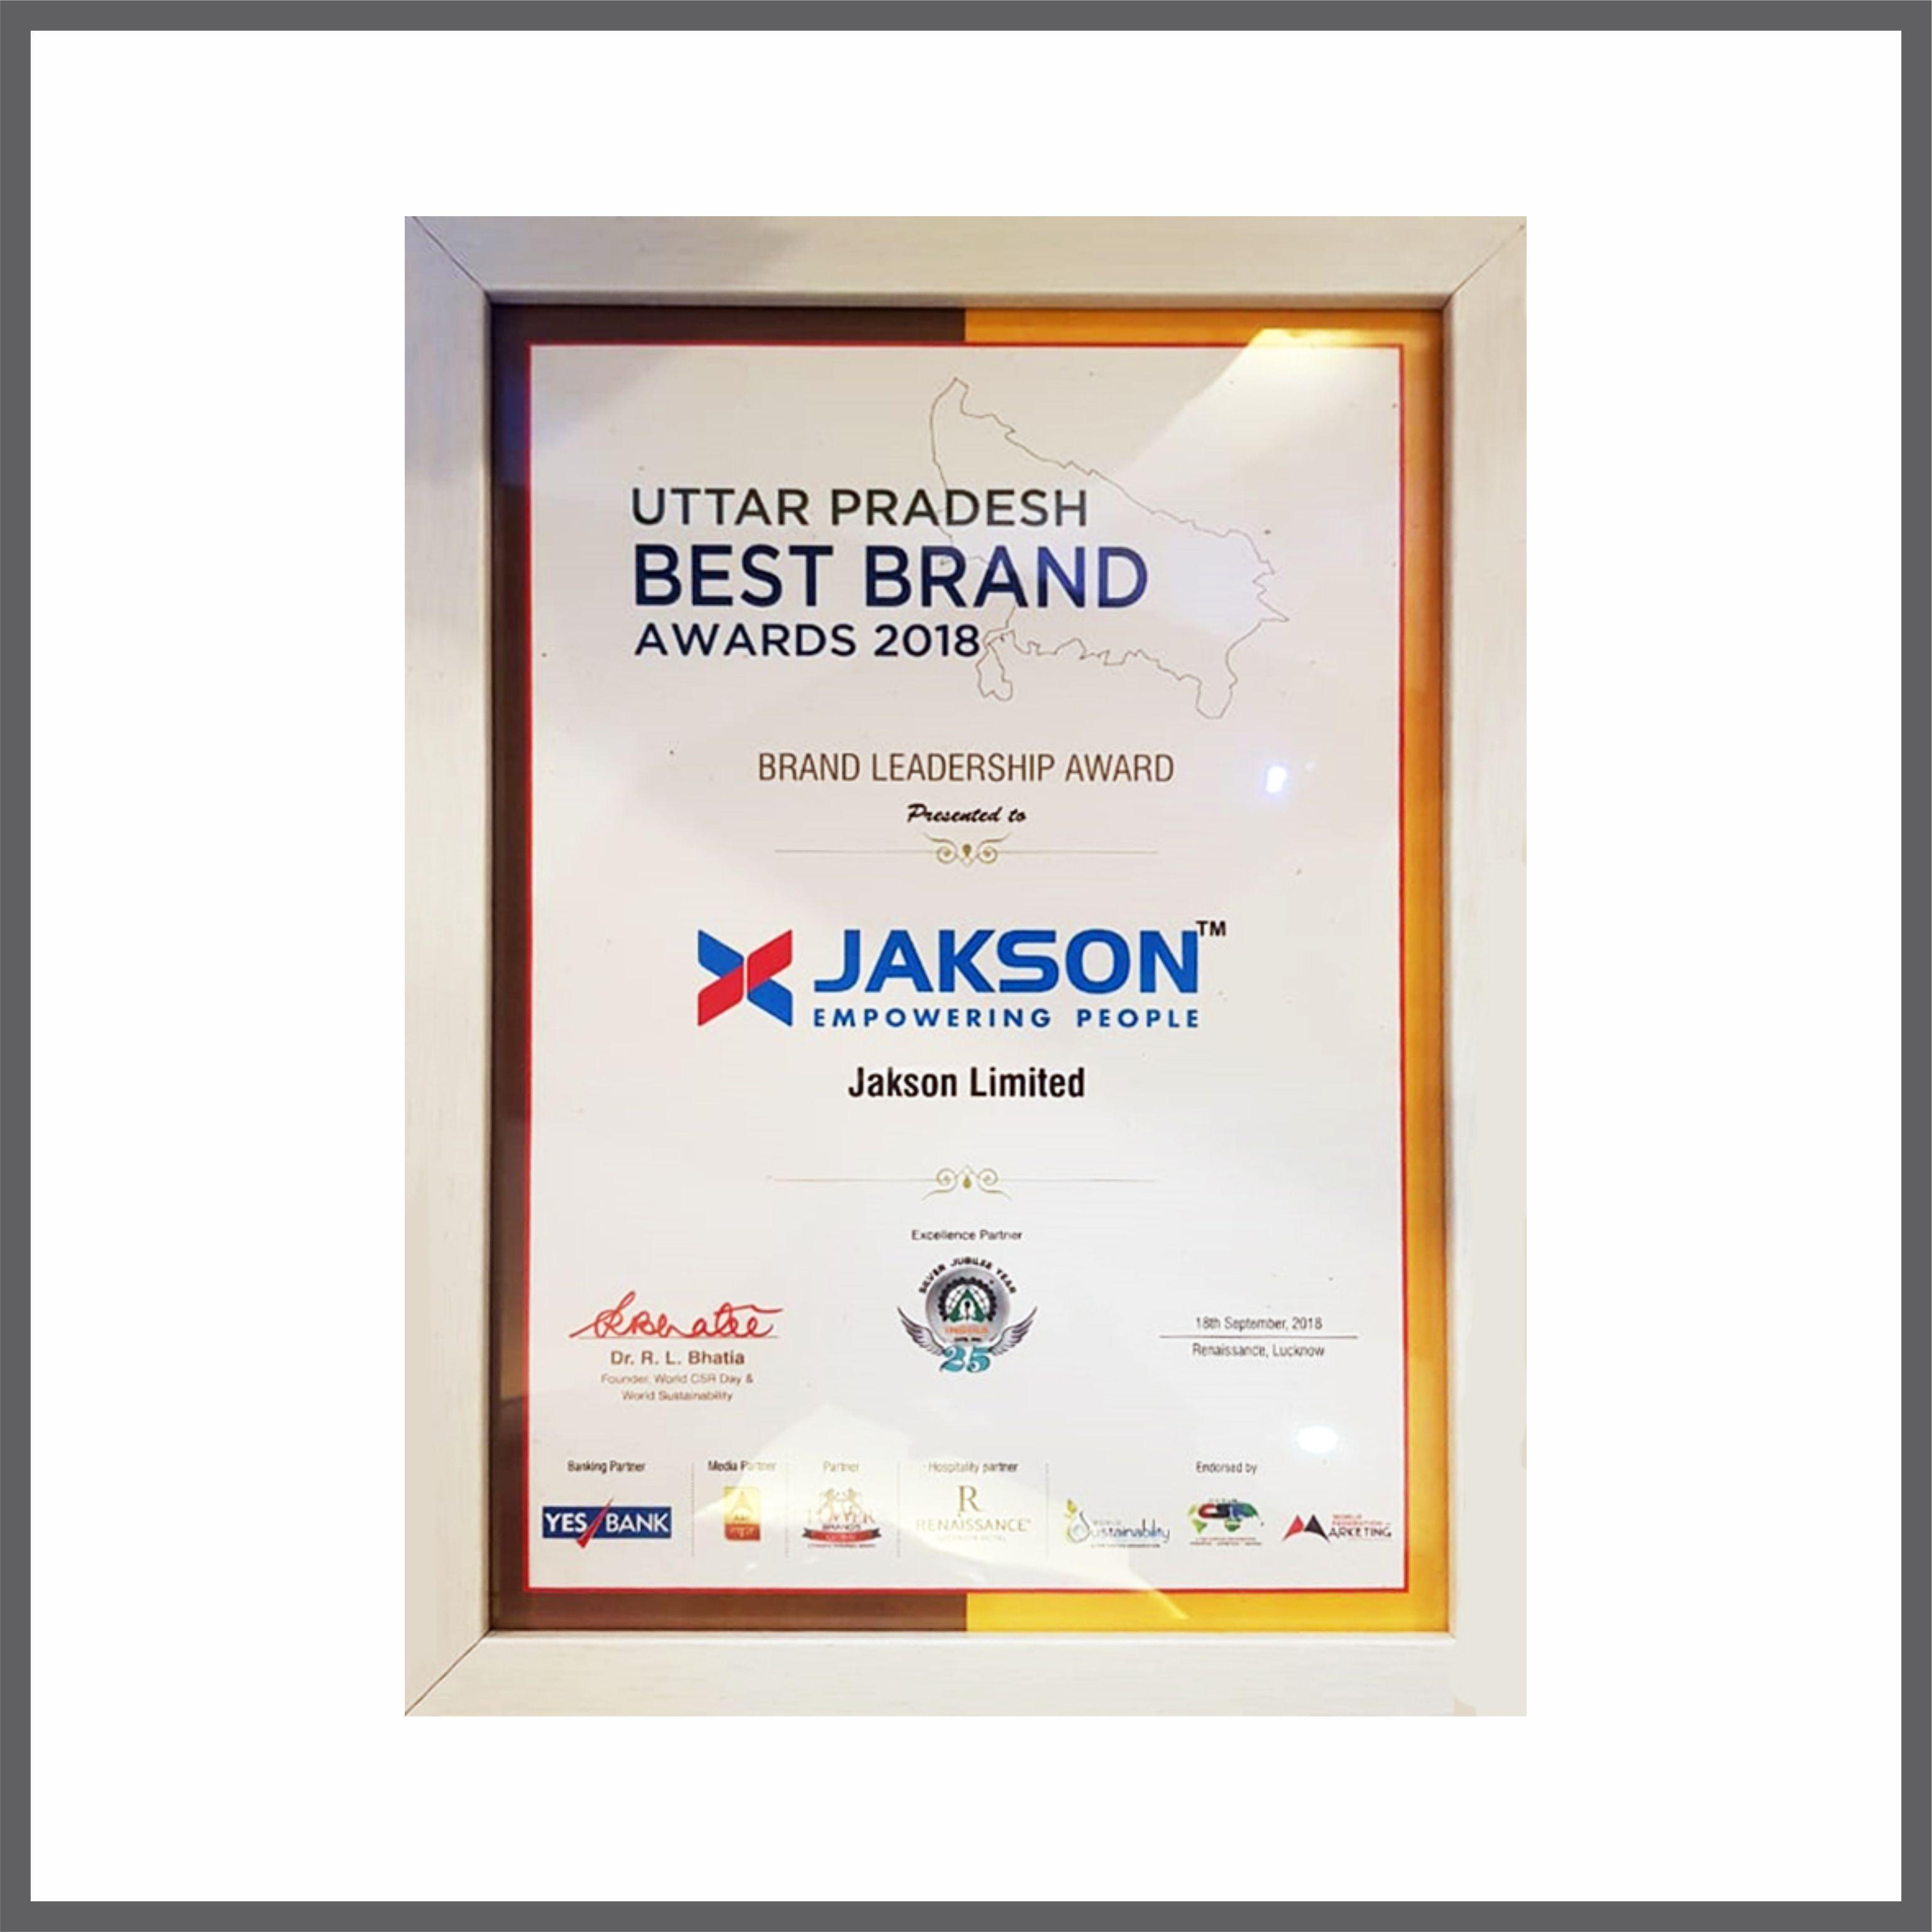 Brand Leadership Award